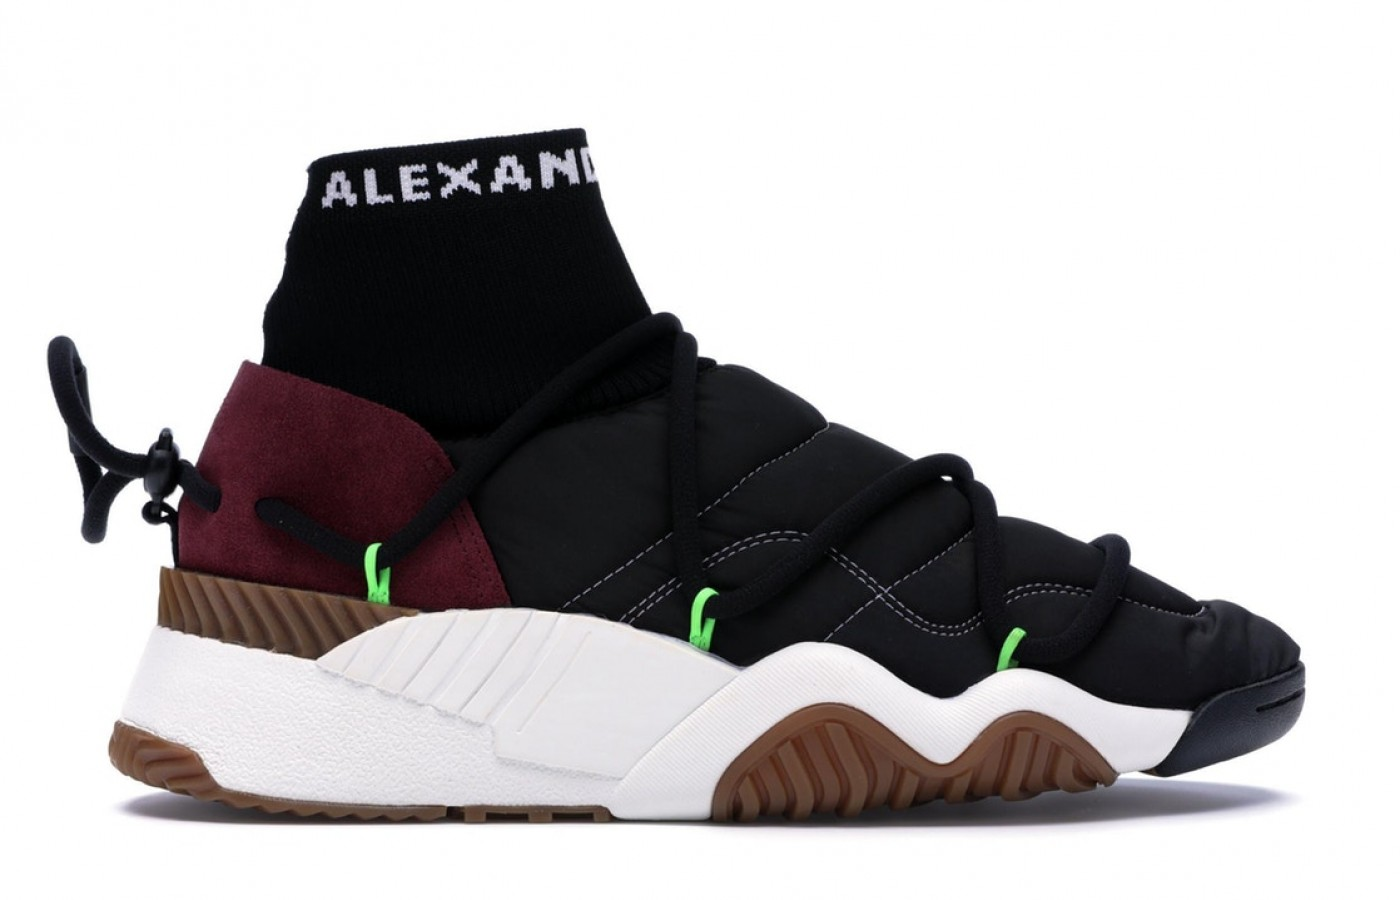 adidas Alexander Wang 2